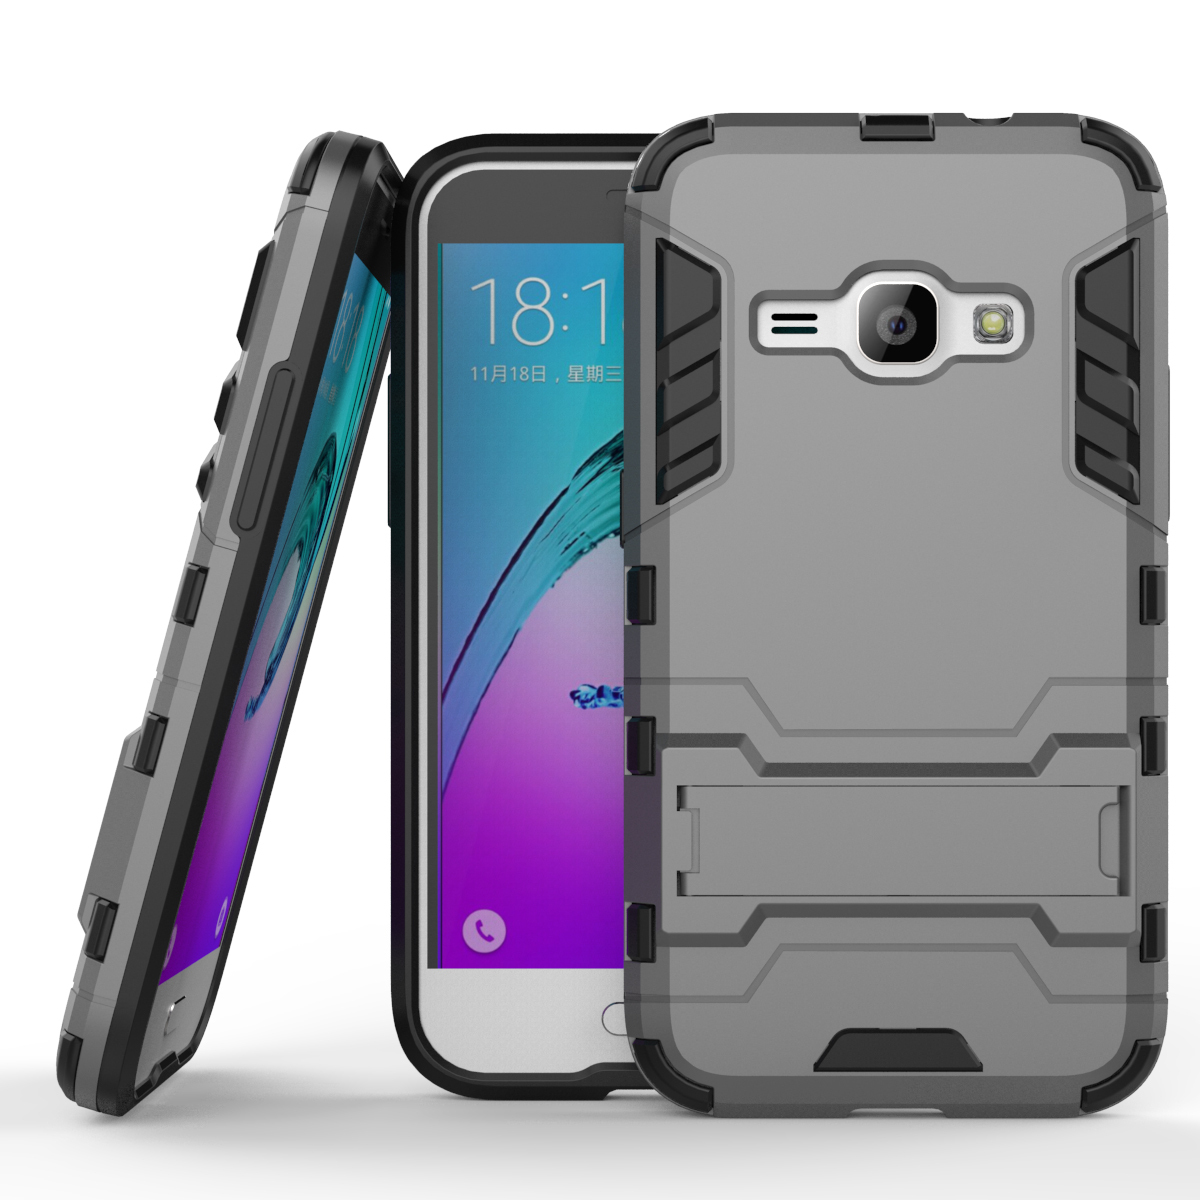 Layer hybrid kickstand protective case for samsung galaxy j1 2016 amp 2 gray p201608181615383120